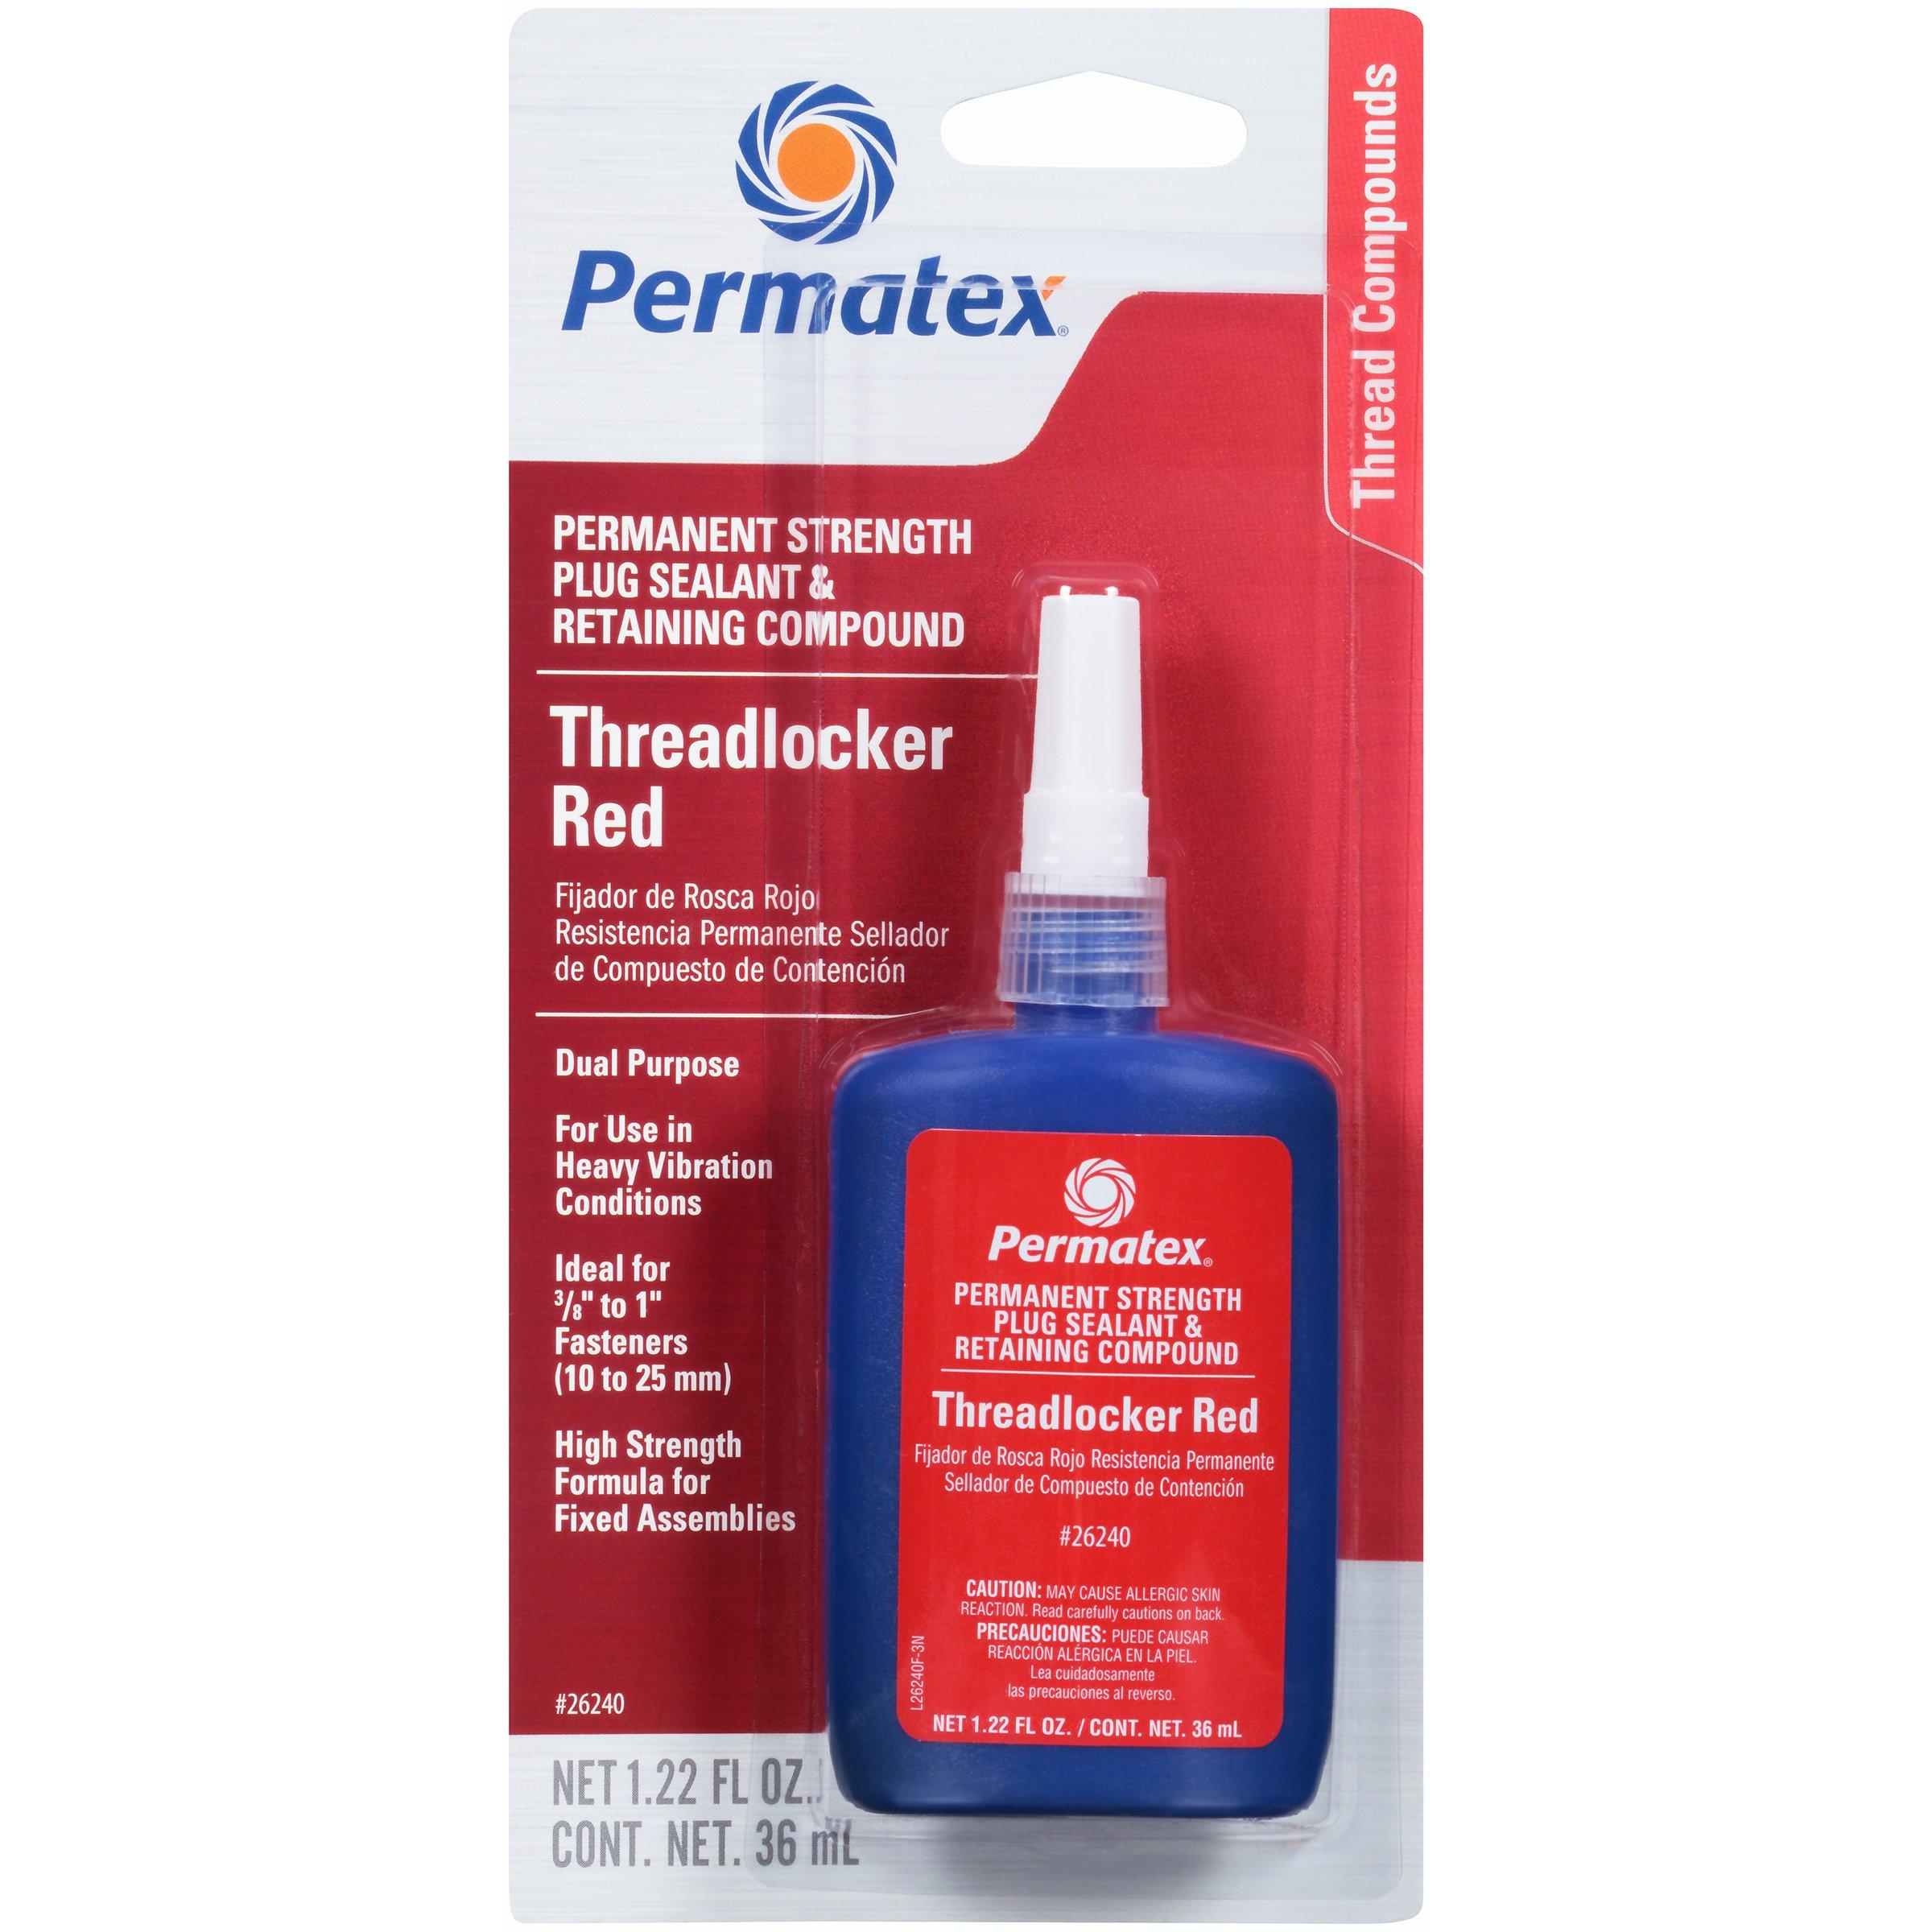 Permatex 26240-6PK Red Permanent Strength Threadlocker - 36 ml Bottle, (Pack of 6) by Permatex